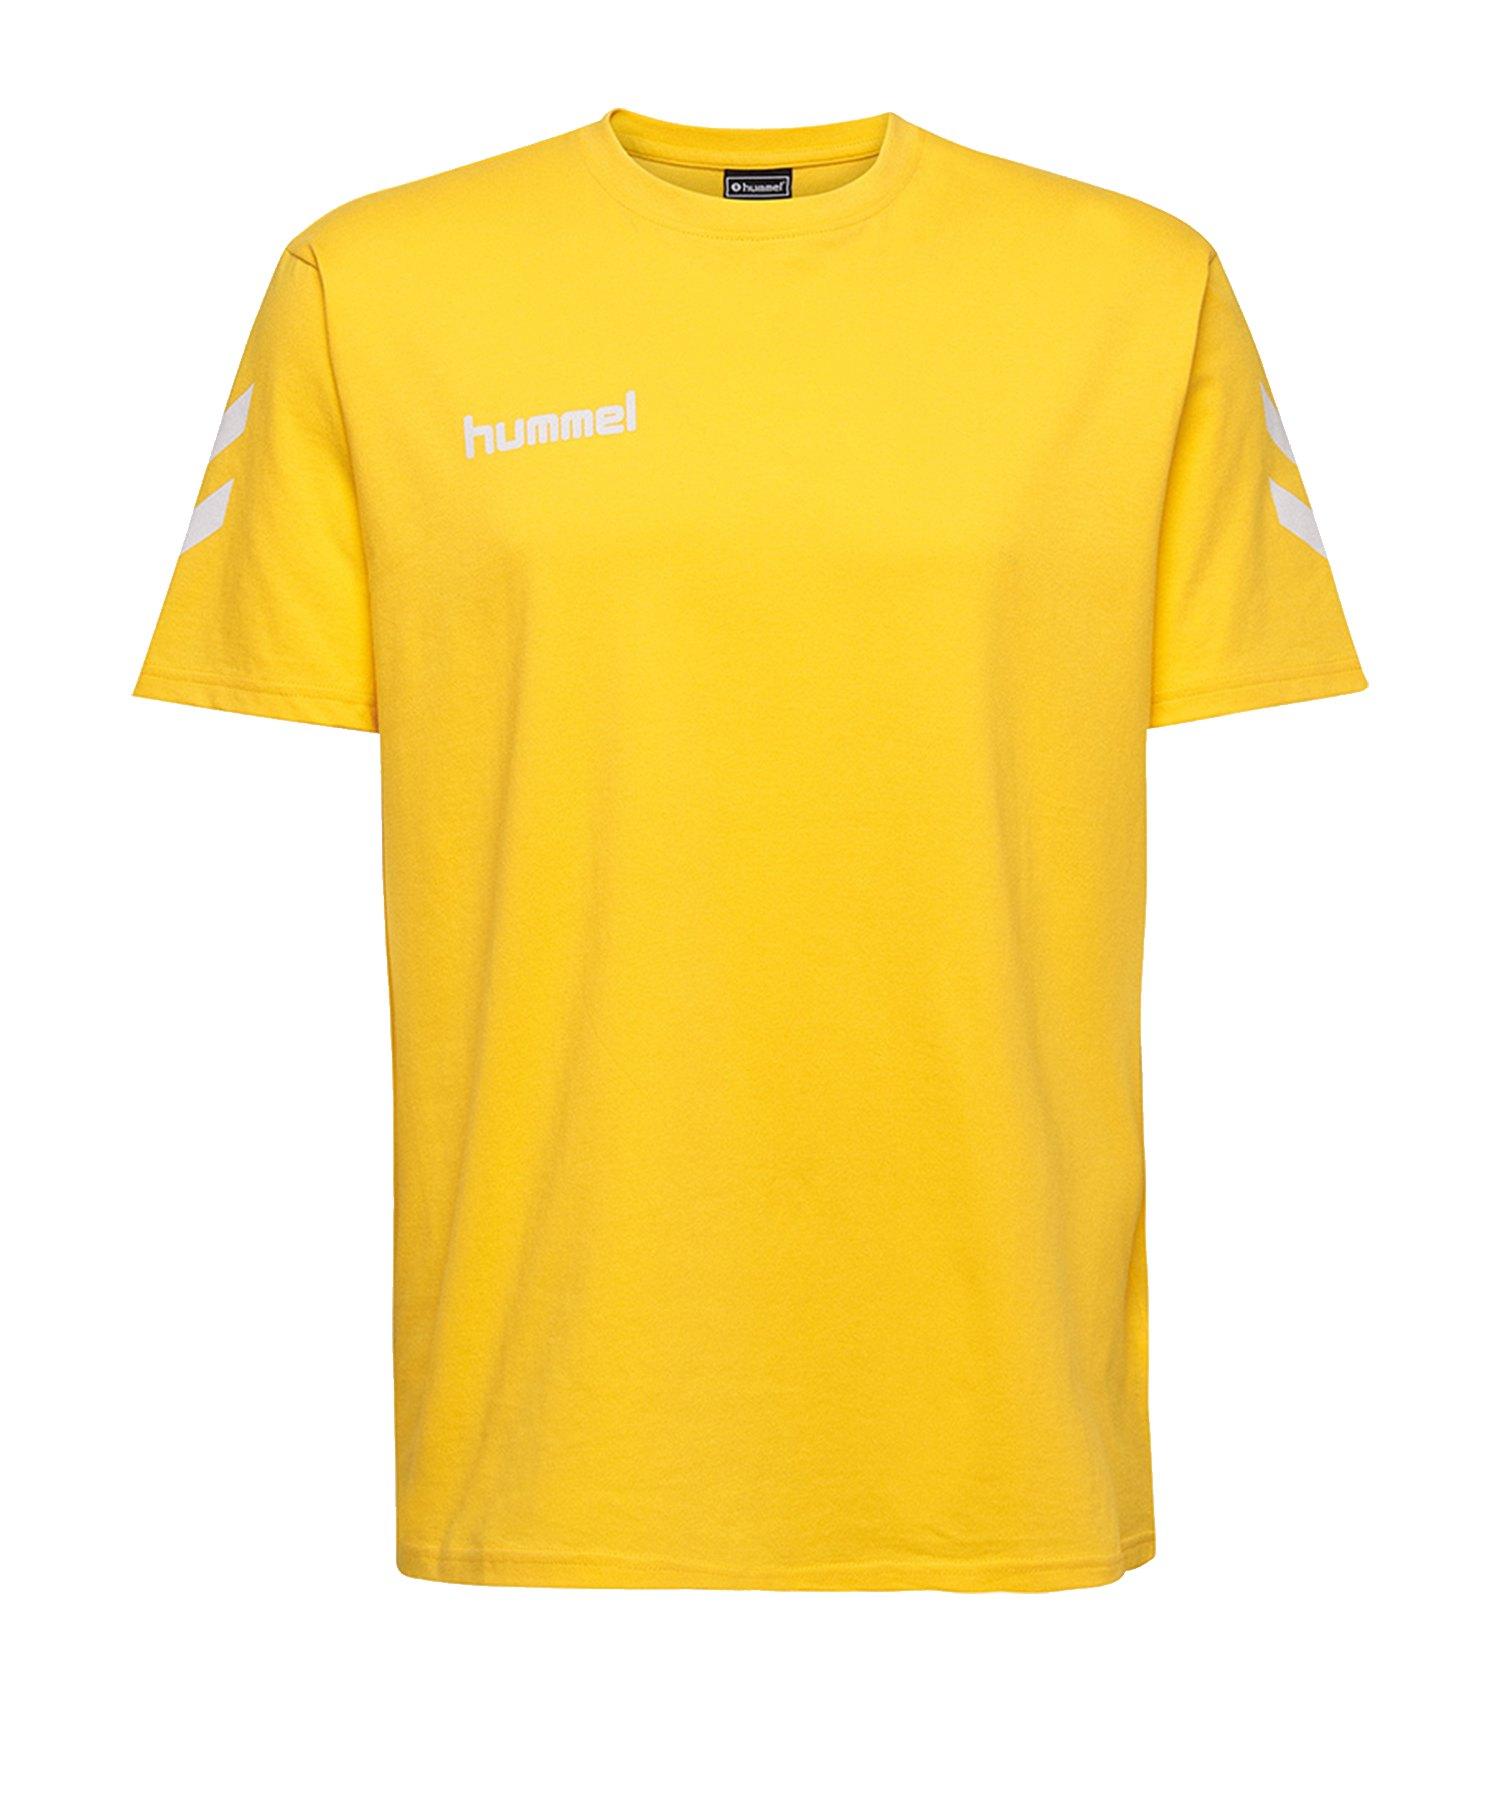 Hummel Cotton T-Shirt Gelb F5001 - Gelb